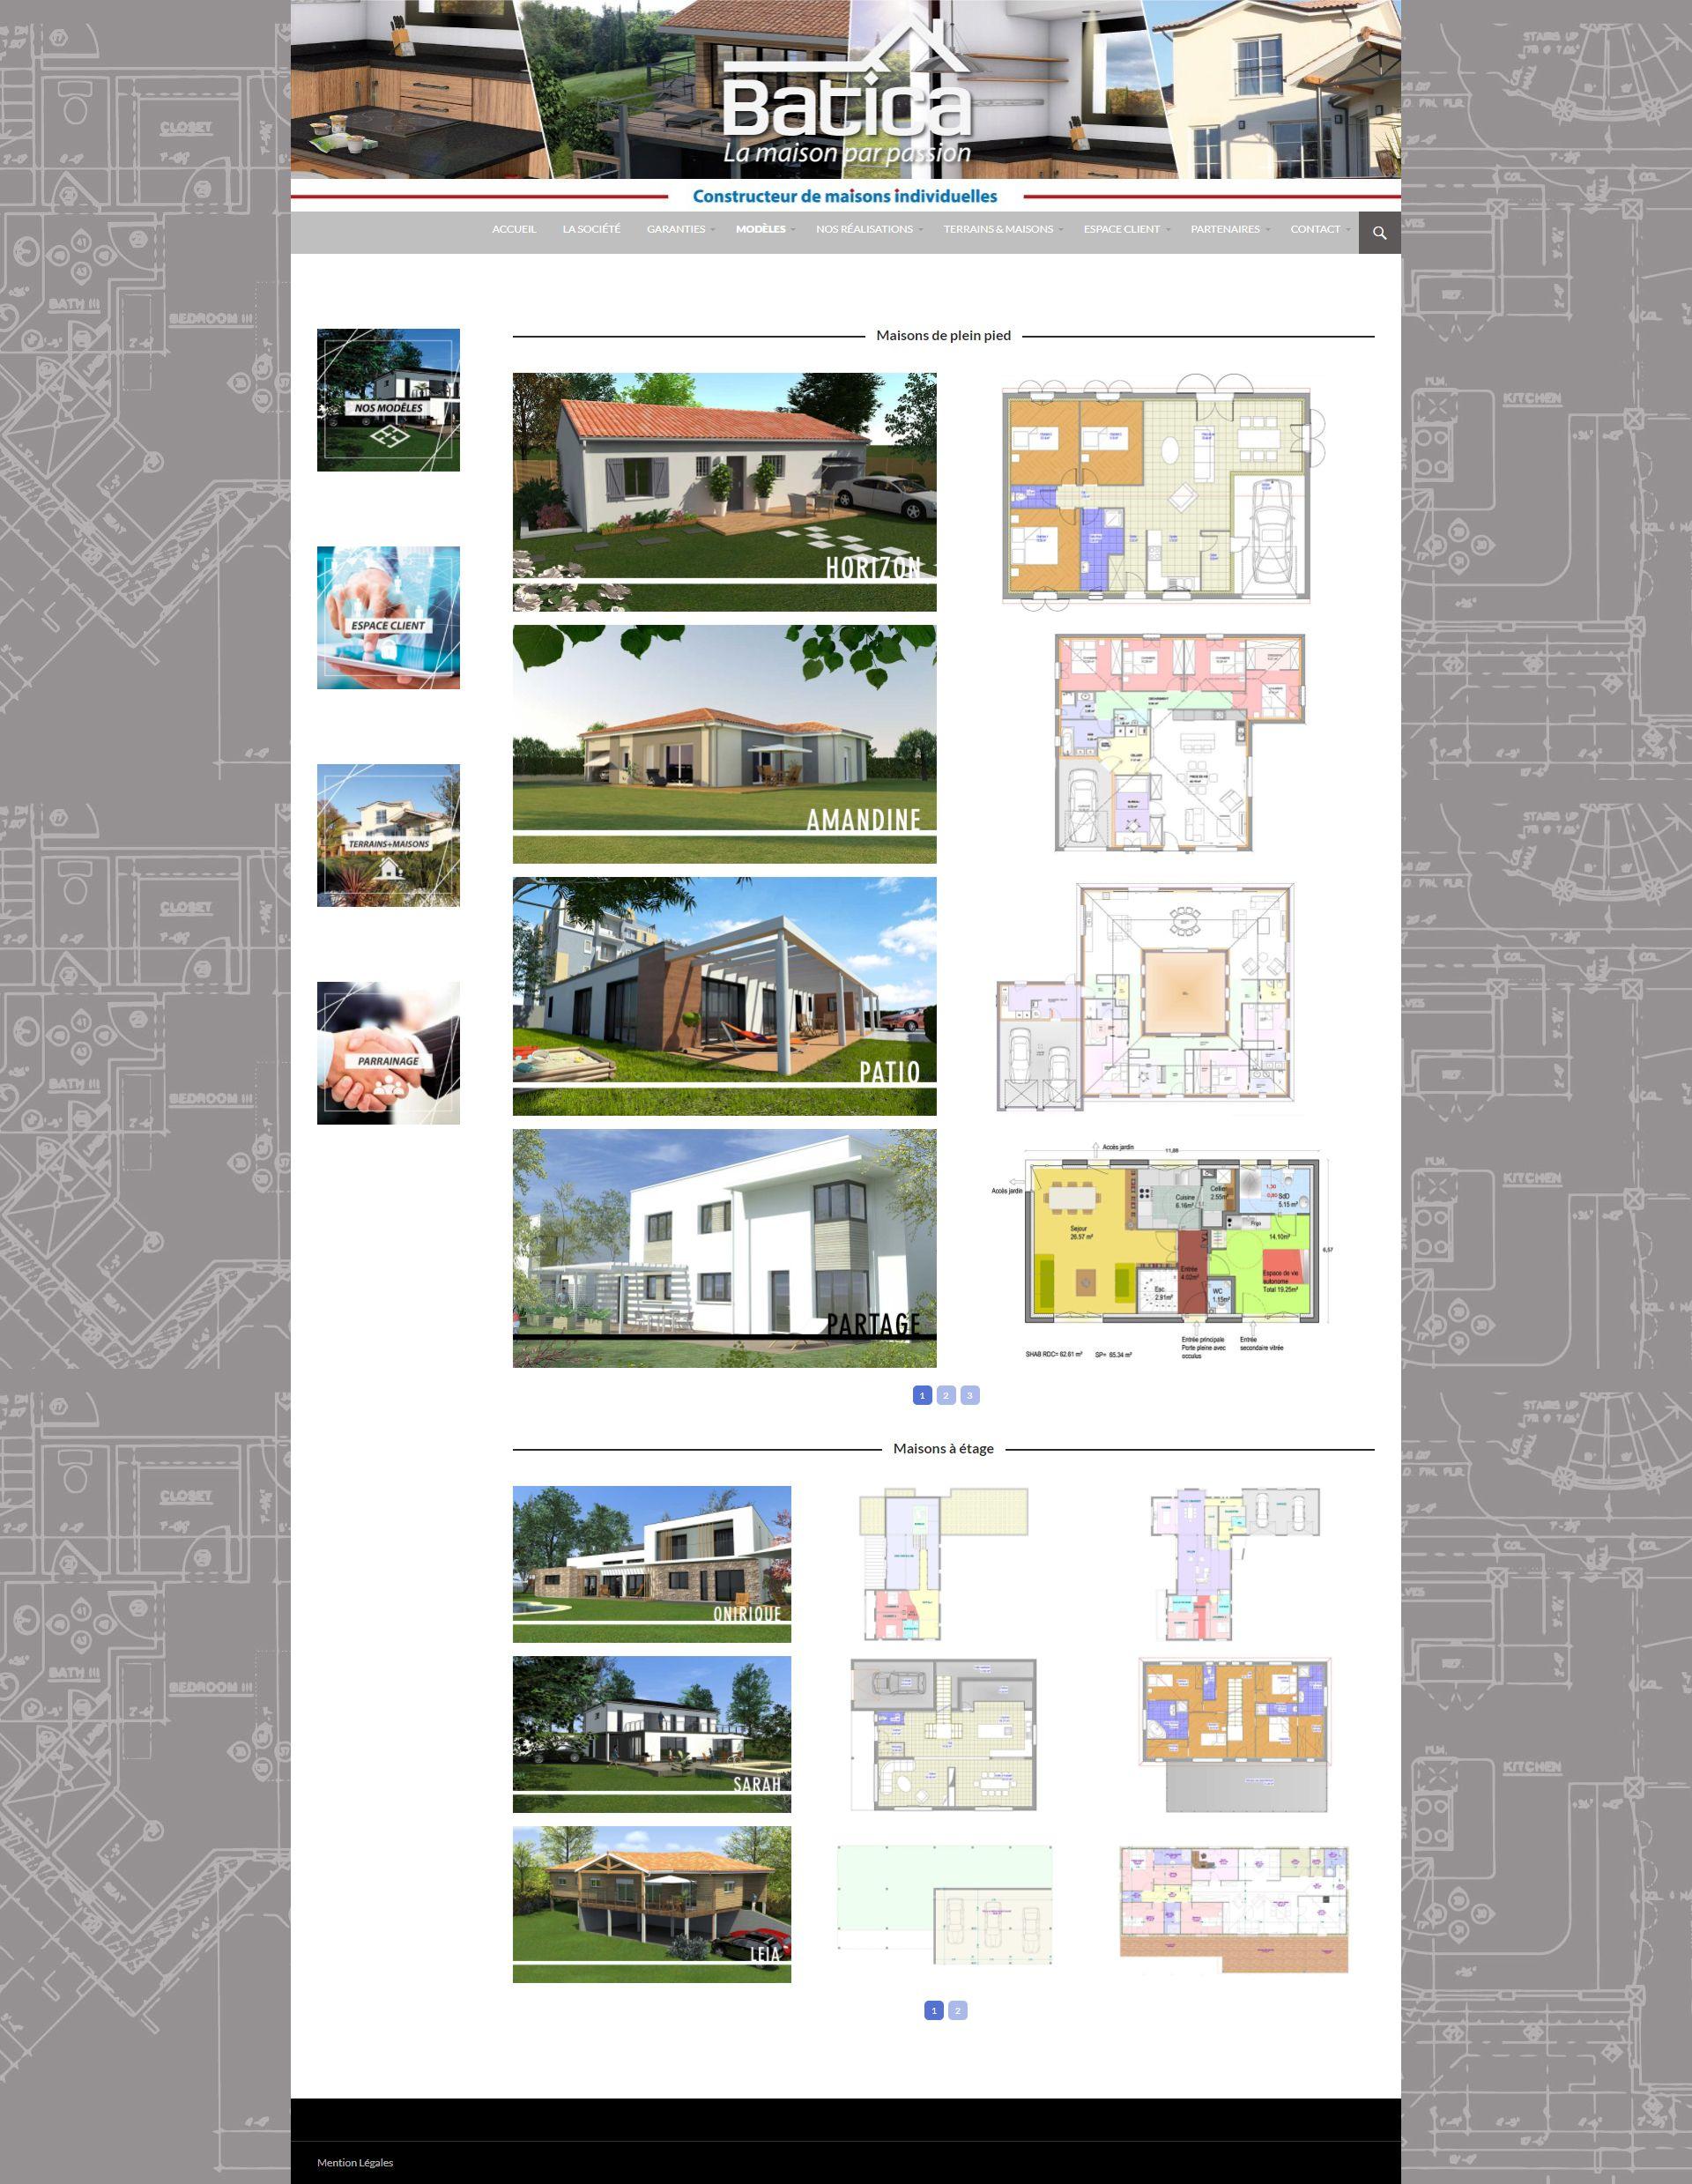 FireShot Pro Screen Capture #005 - 'nos modèles I BATICA I Constructeur de maisons individuelles' - www_batica33_fr_nos-modeles